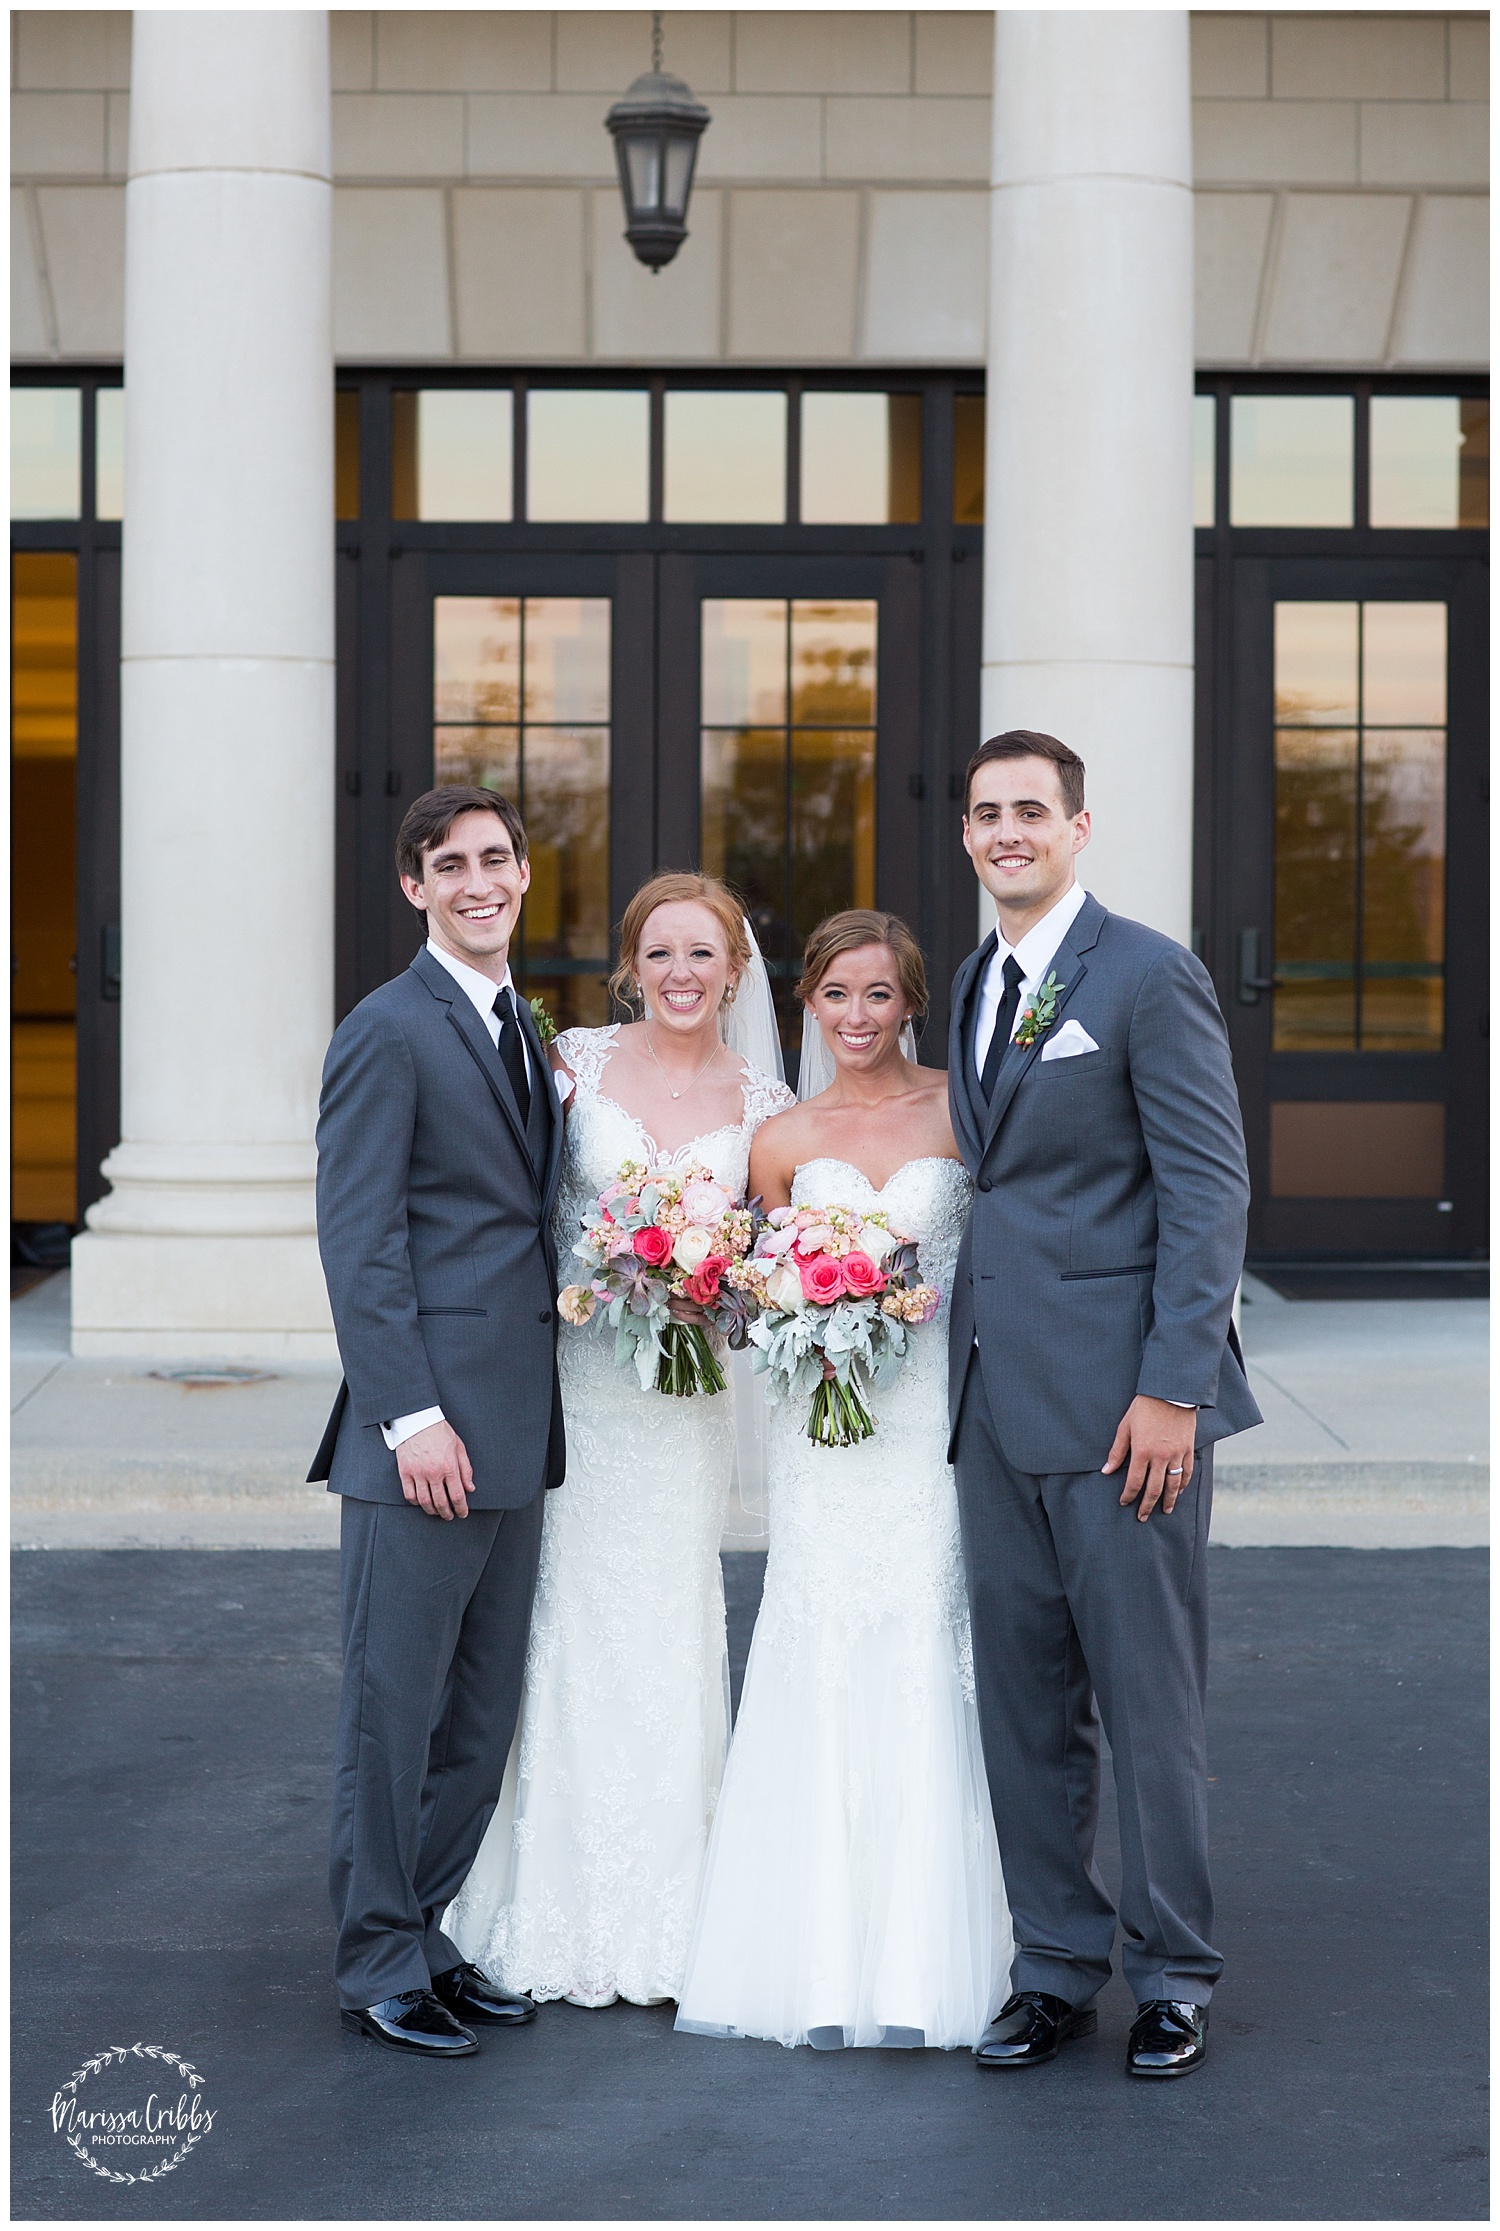 Twin Double Wedding | Union Horse Distilling Co. | Marissa Cribbs Photography | KC Weddings_0165.jpg